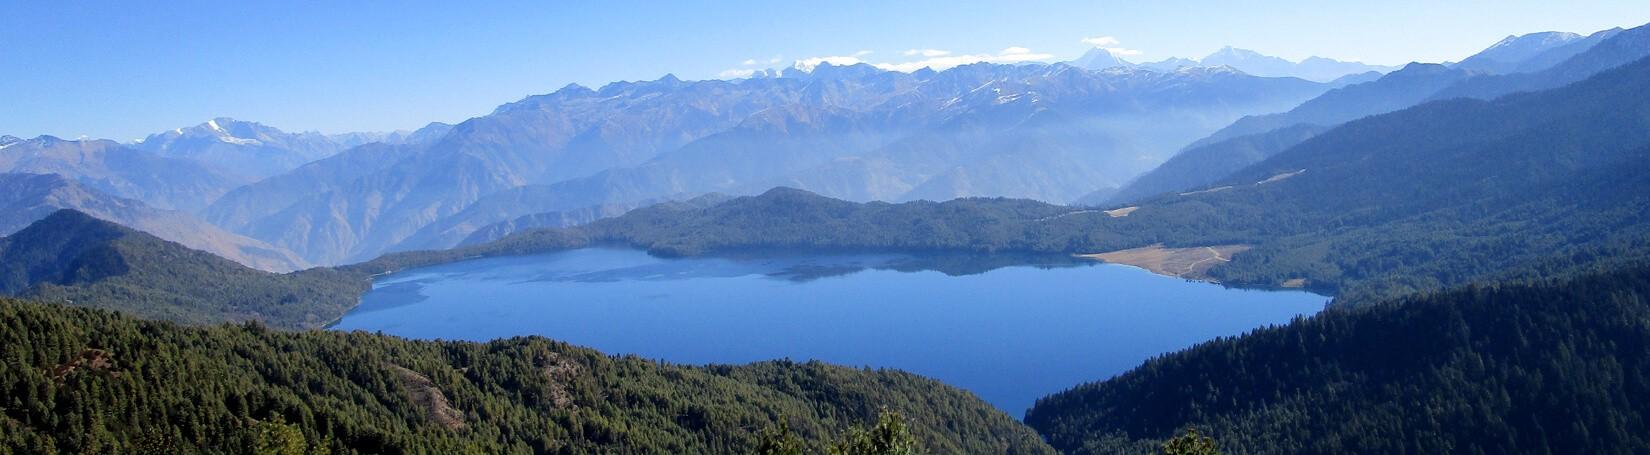 Rara Lake view from Murma Top